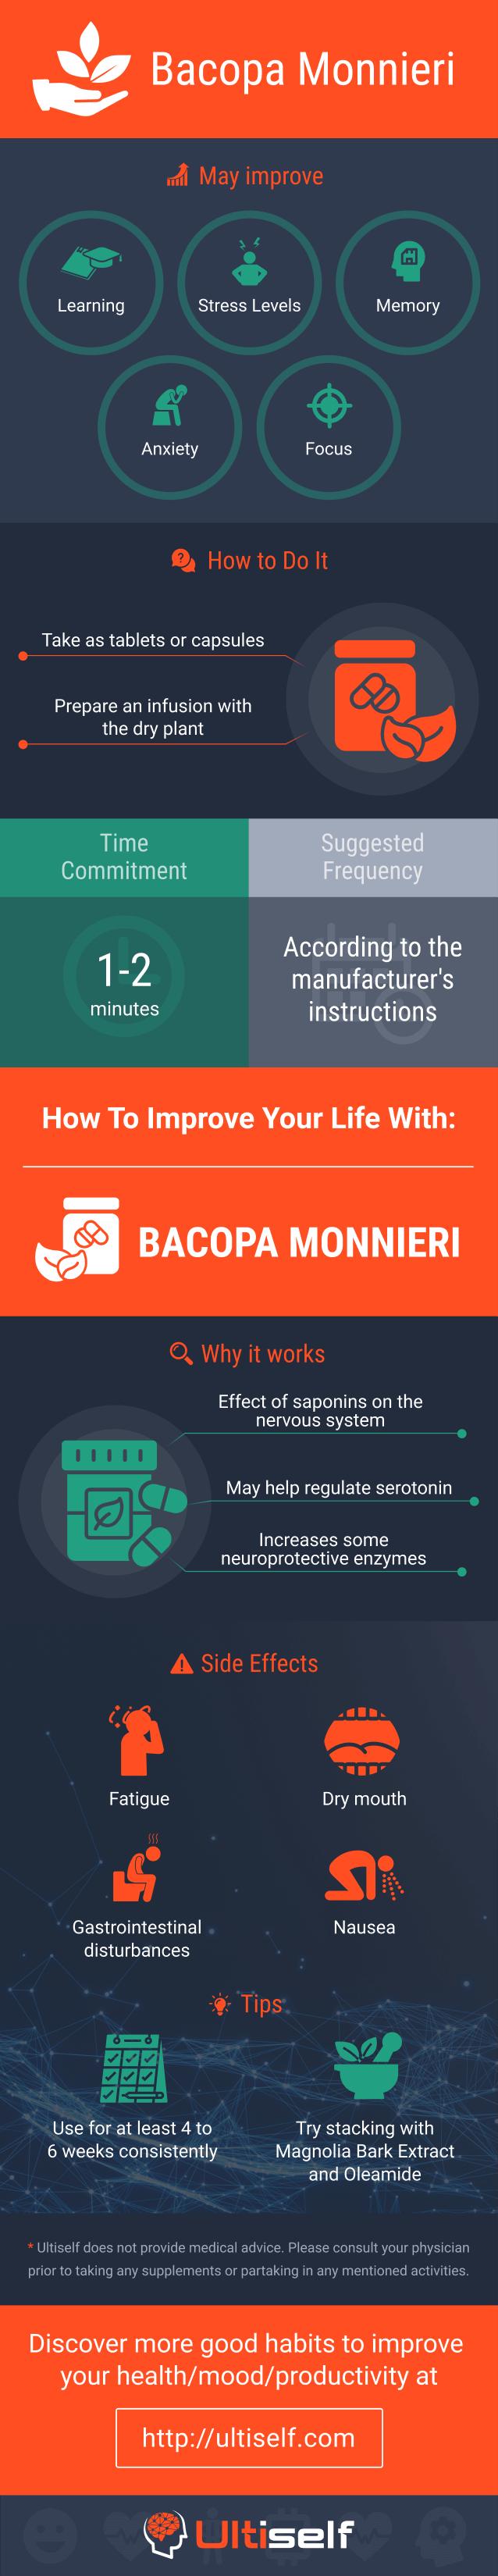 Bacopa Monnieri infographic